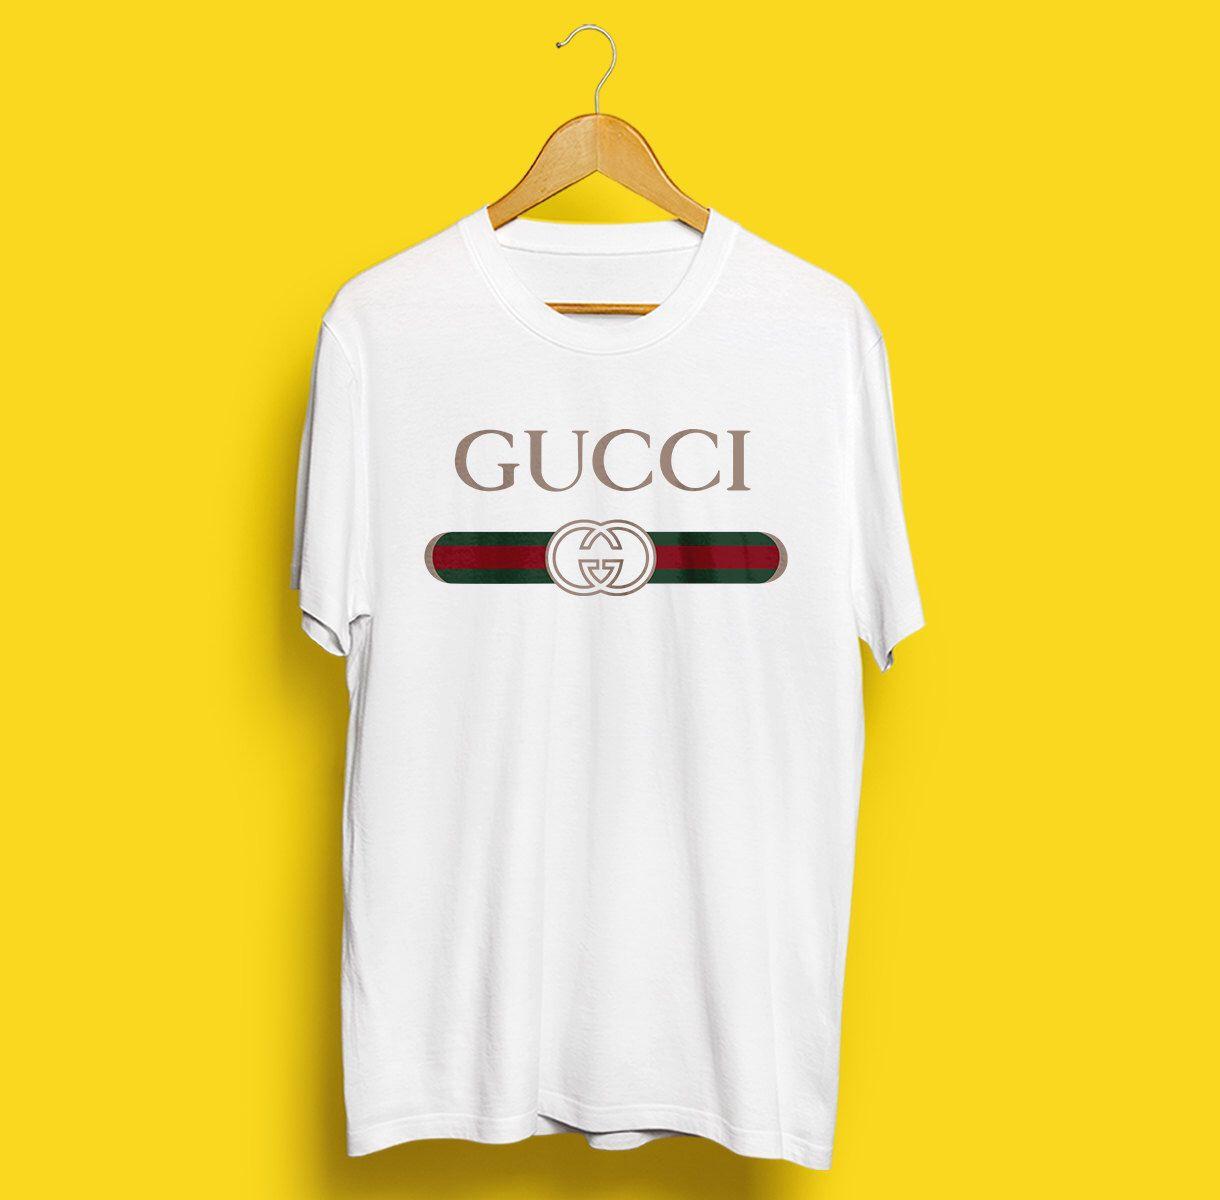 Gucci Inspired Tshirt Chanel Louis Vuitton Supreme Coco